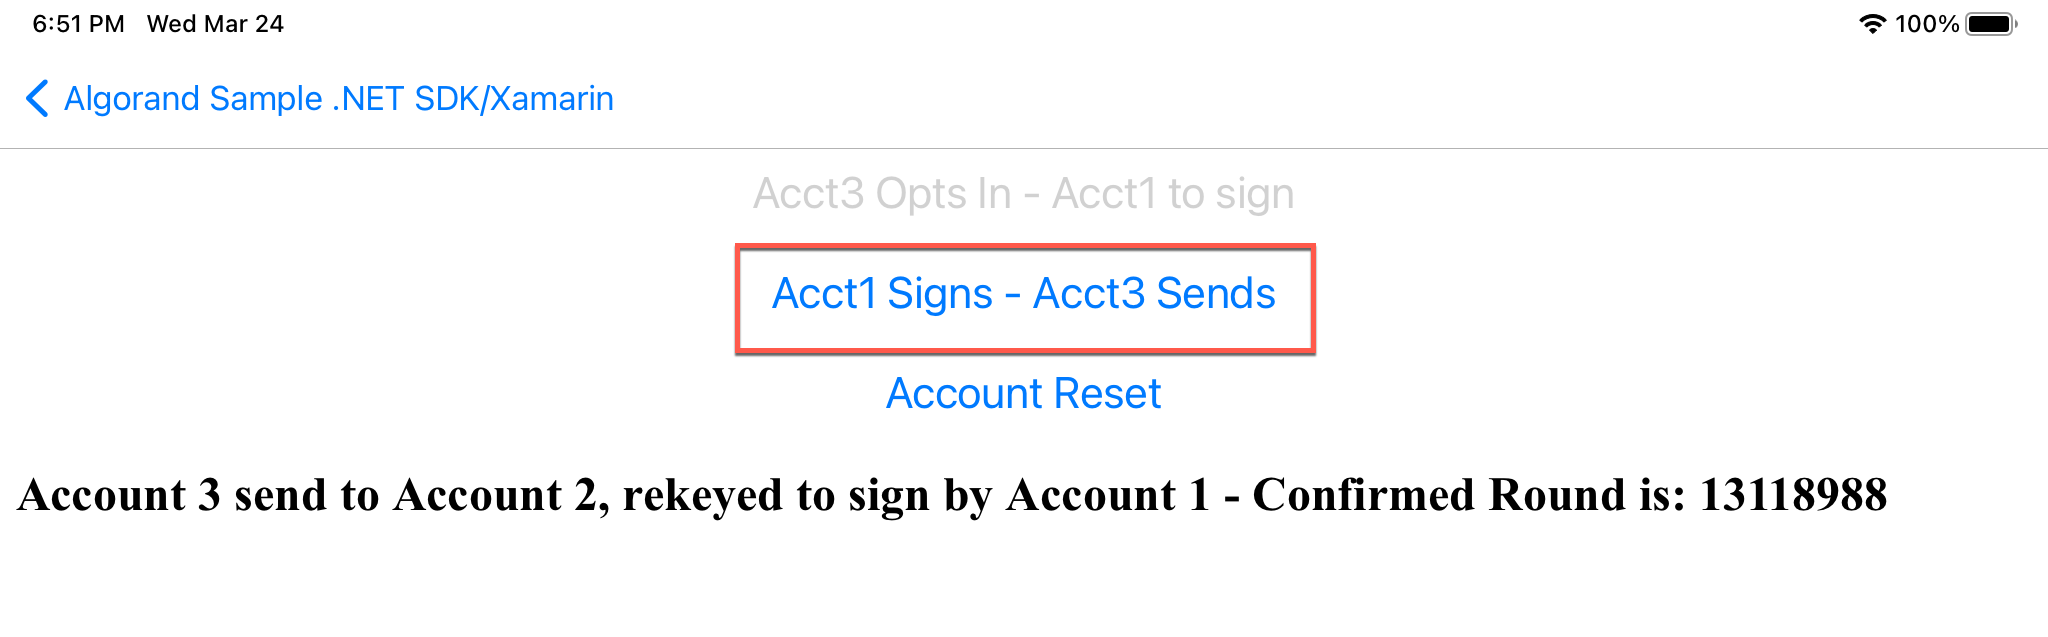 Rekeyed Account Signs